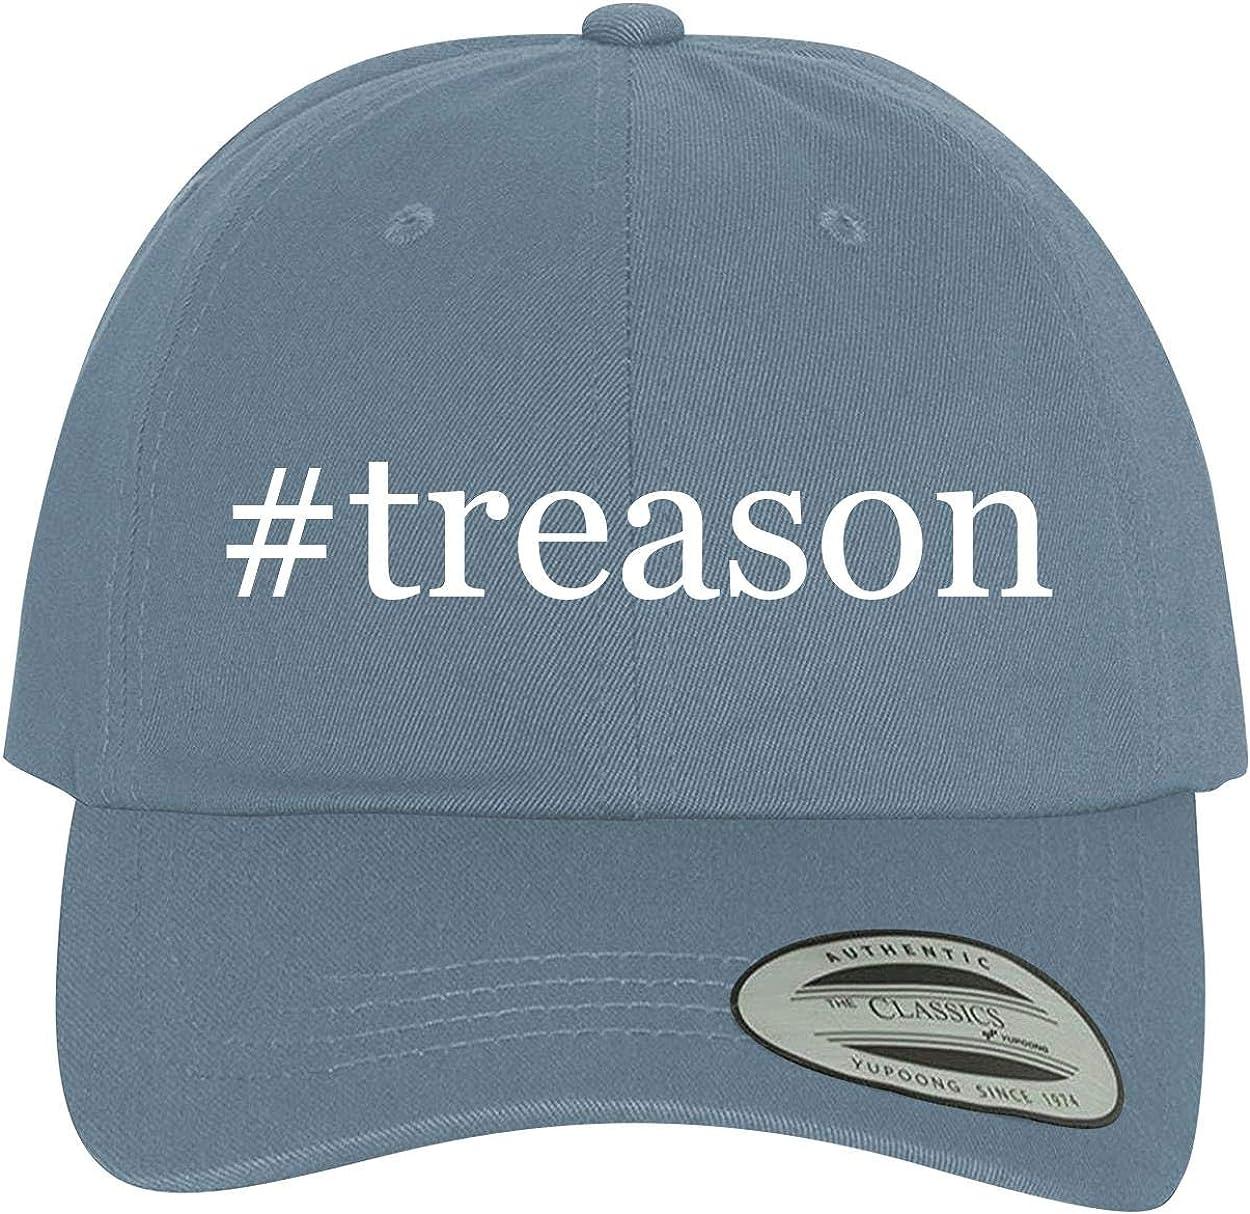 Comfortable Dad Hat Baseball Cap BH Cool Designs #Treason